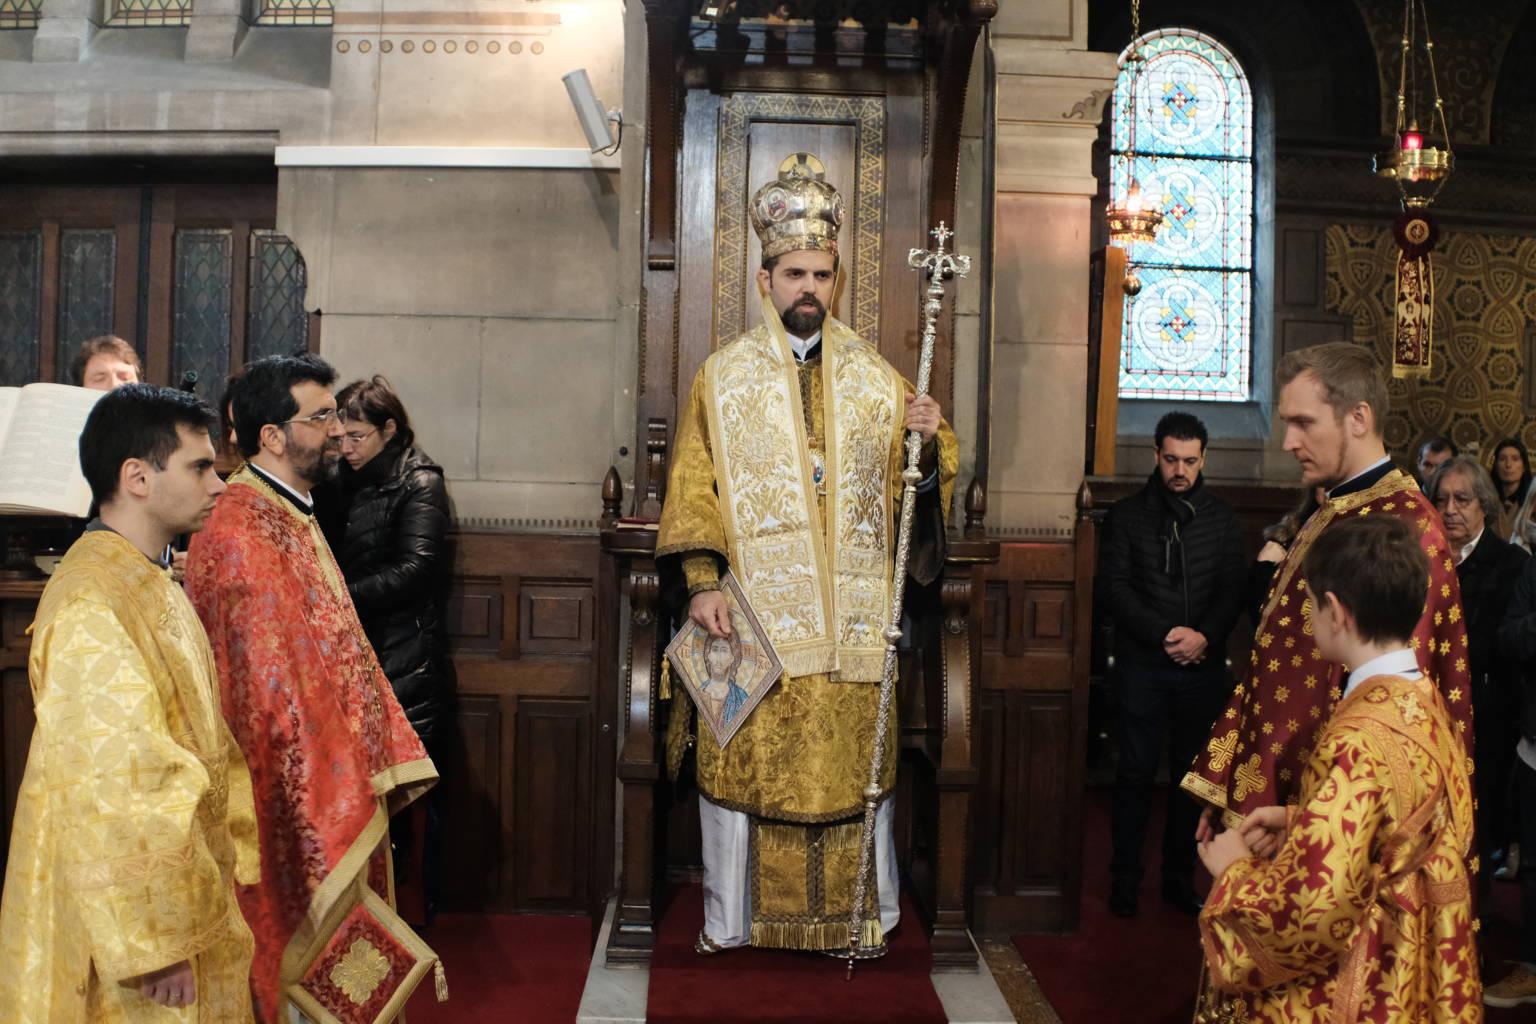 DSCF2829 - Επίσκοπος Μελιτηνής: η θυσιαστική πορεία των Χριστιανών αποτελεί καταξίωση